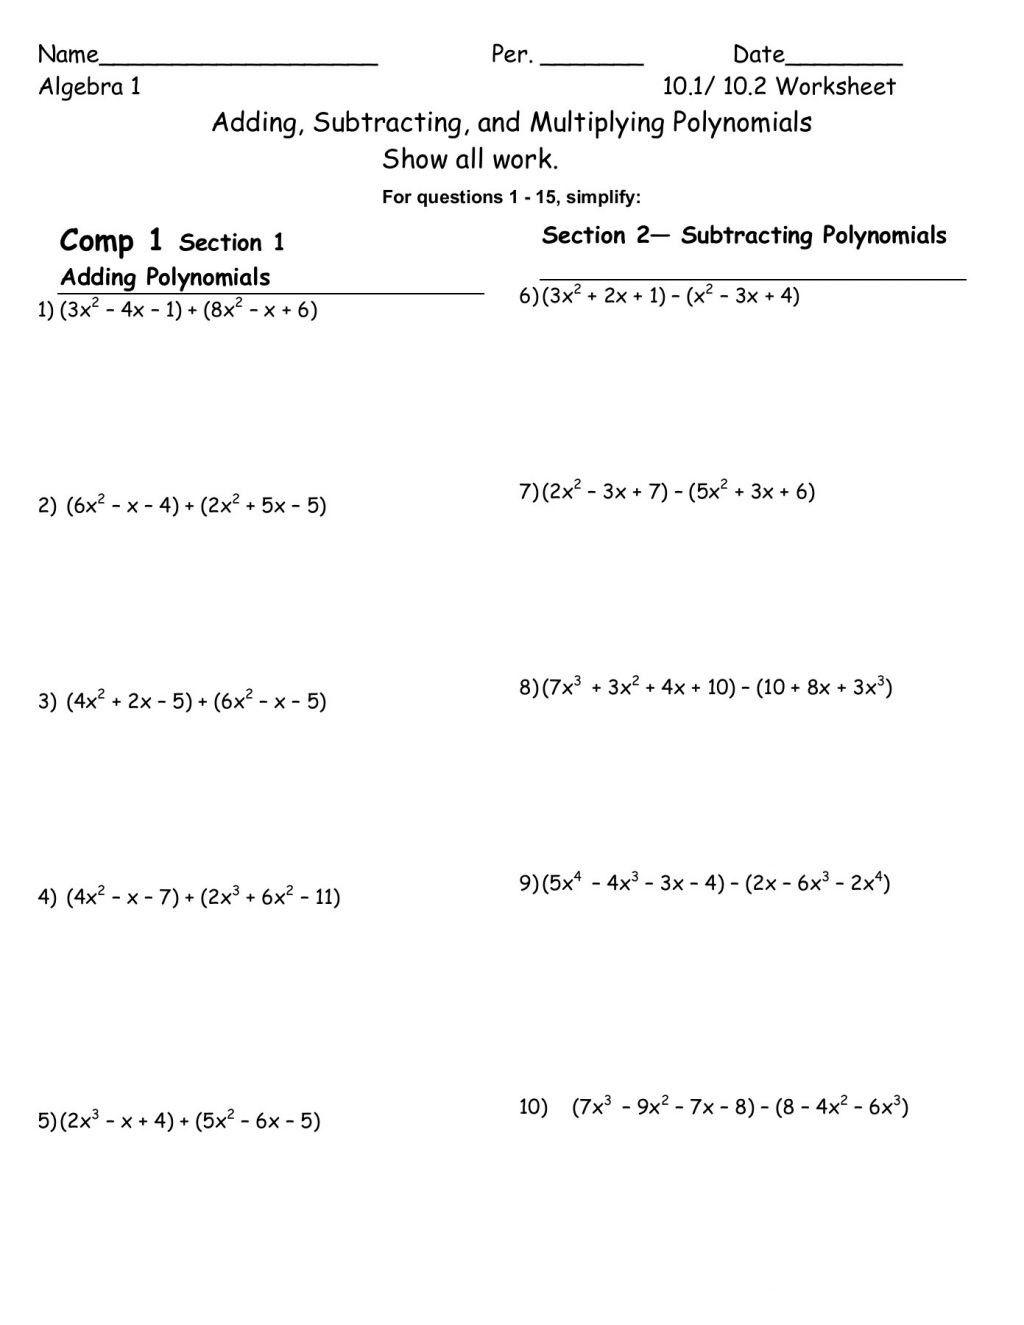 Subtracting Polynomials Worksheet